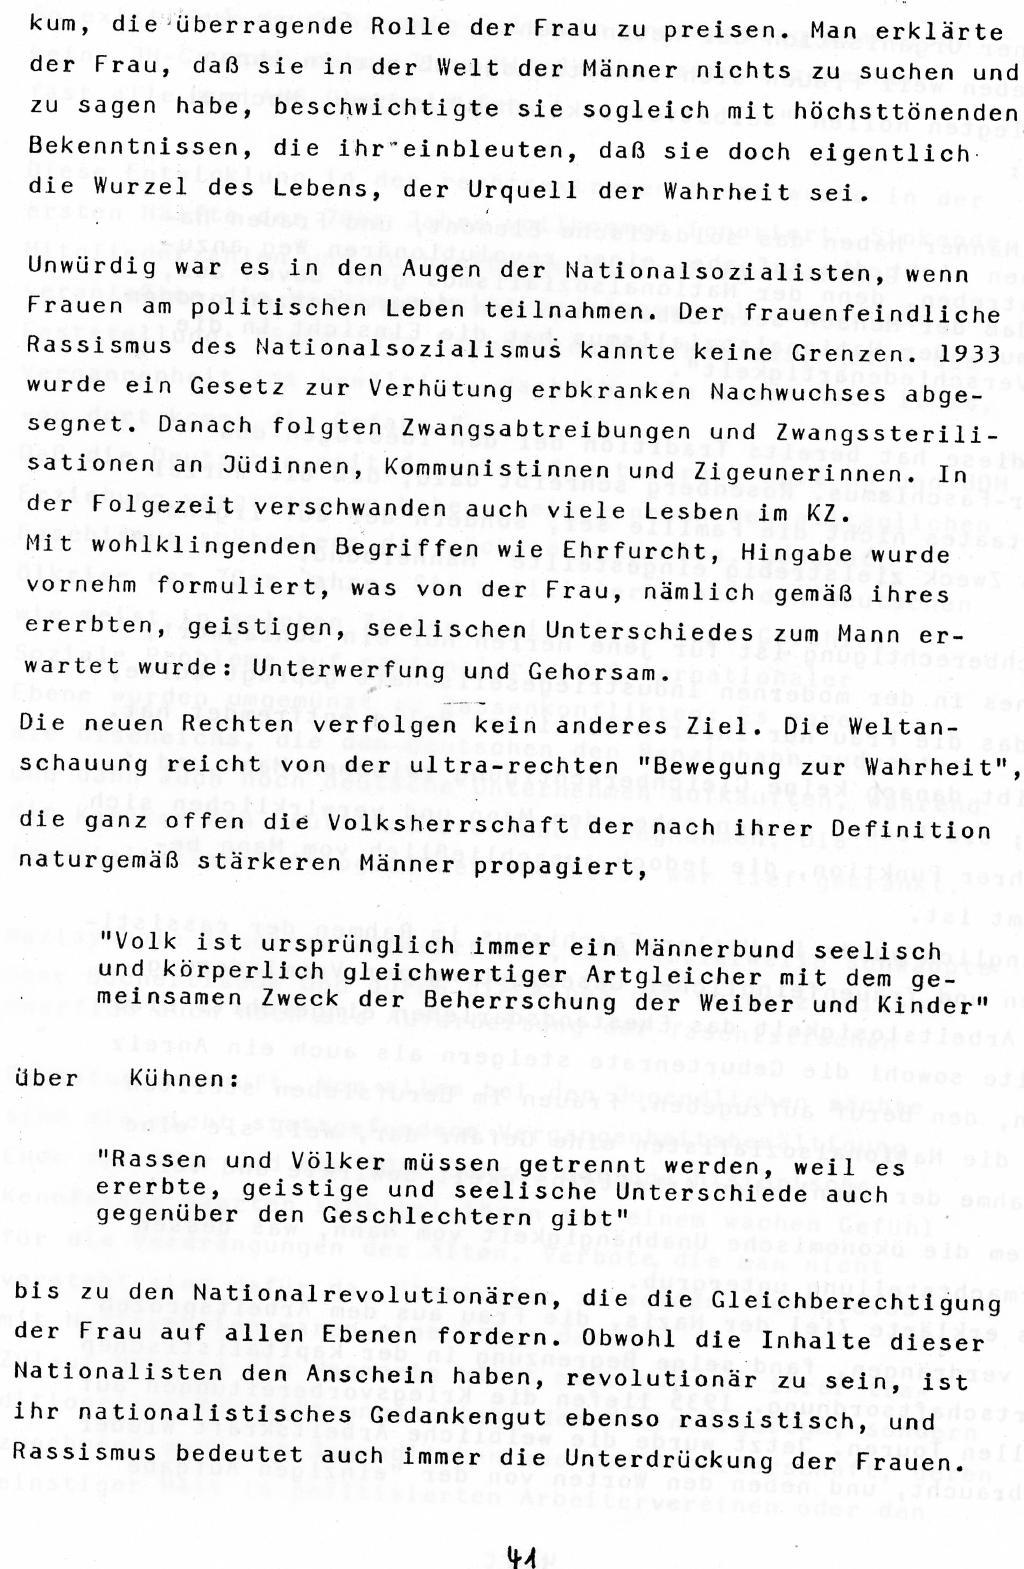 Berlin_1983_Autonome_Gruppen_Faschismus_im_Kapitalismus_41